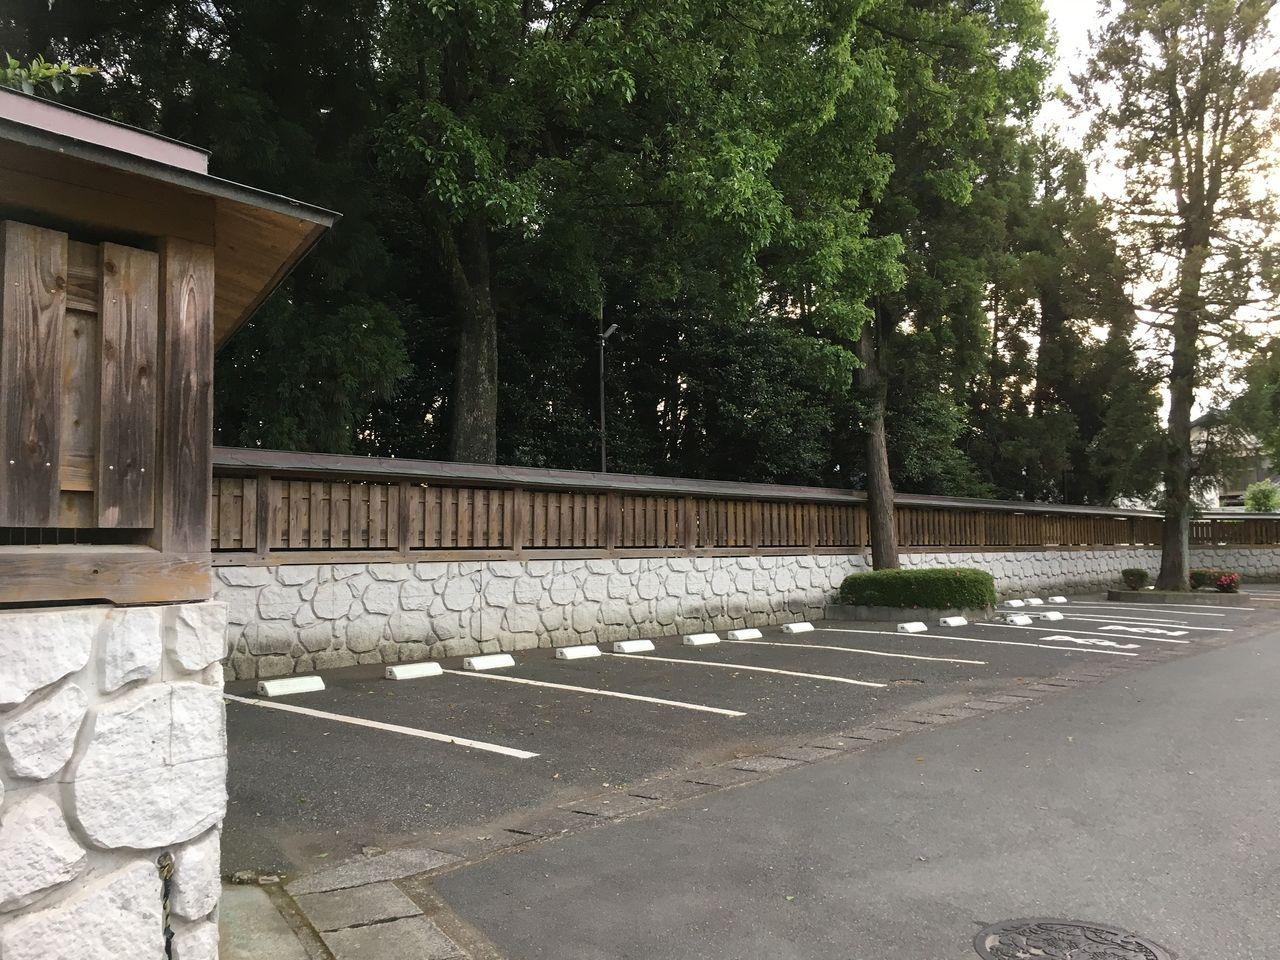 初夏の健軍神社・北門側の駐車場